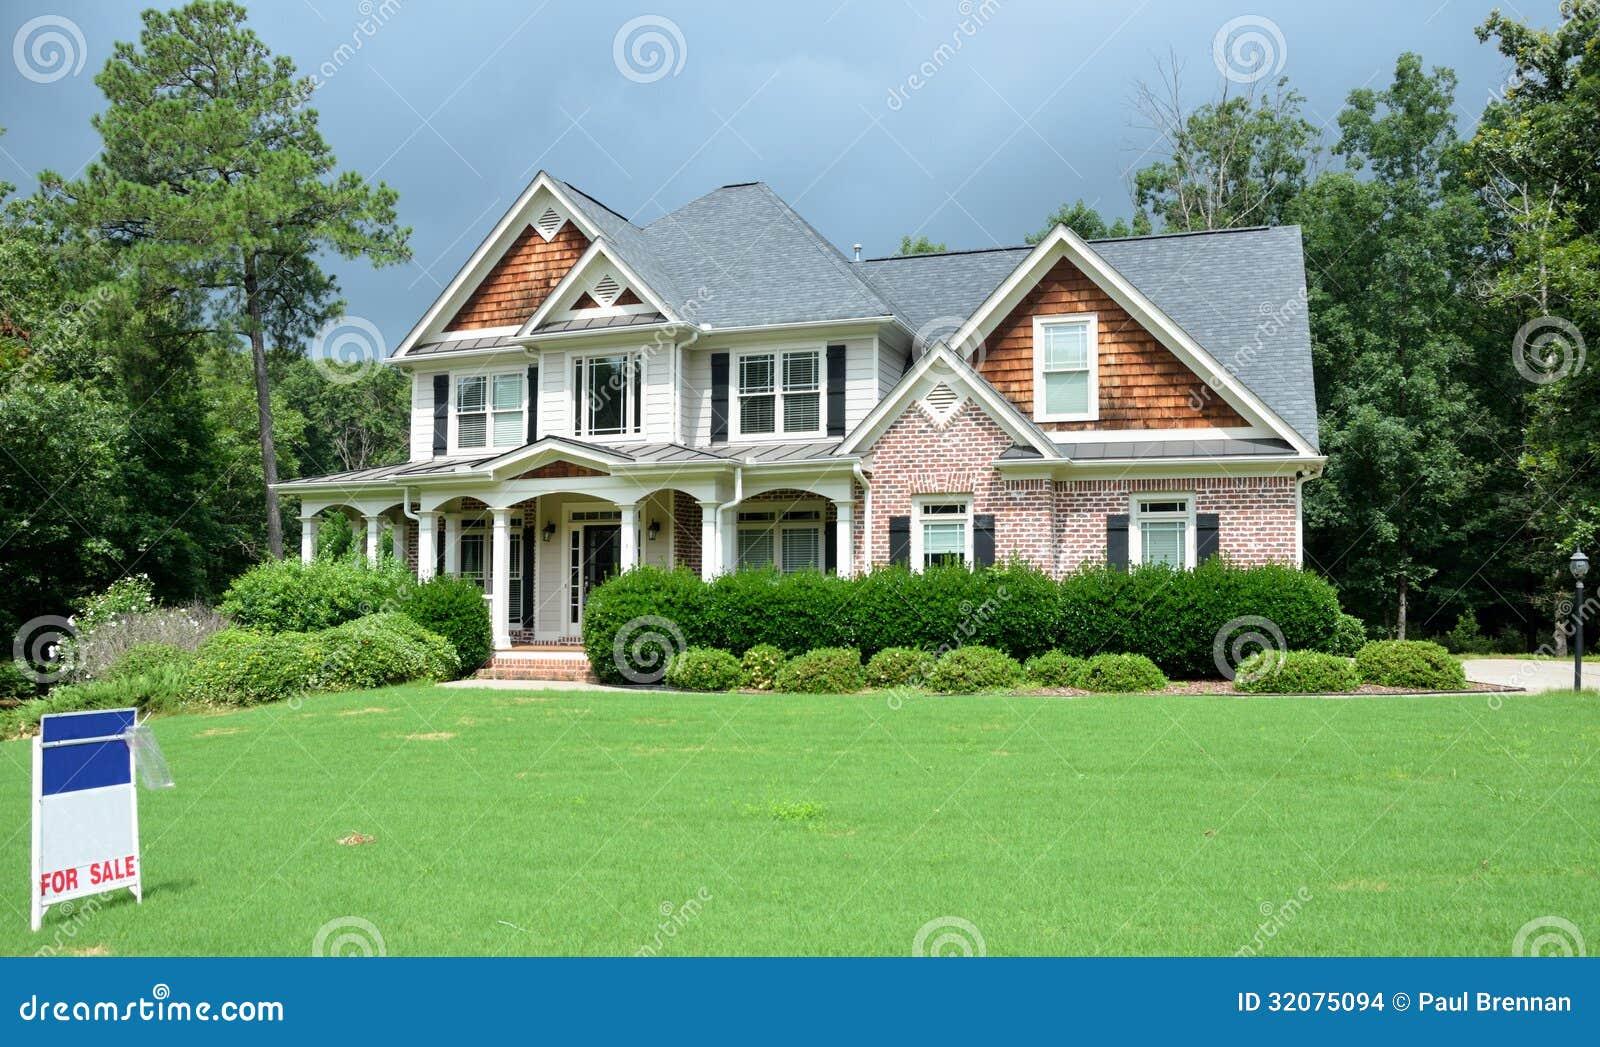 grande maison de luxe vendre images stock image 32075094. Black Bedroom Furniture Sets. Home Design Ideas